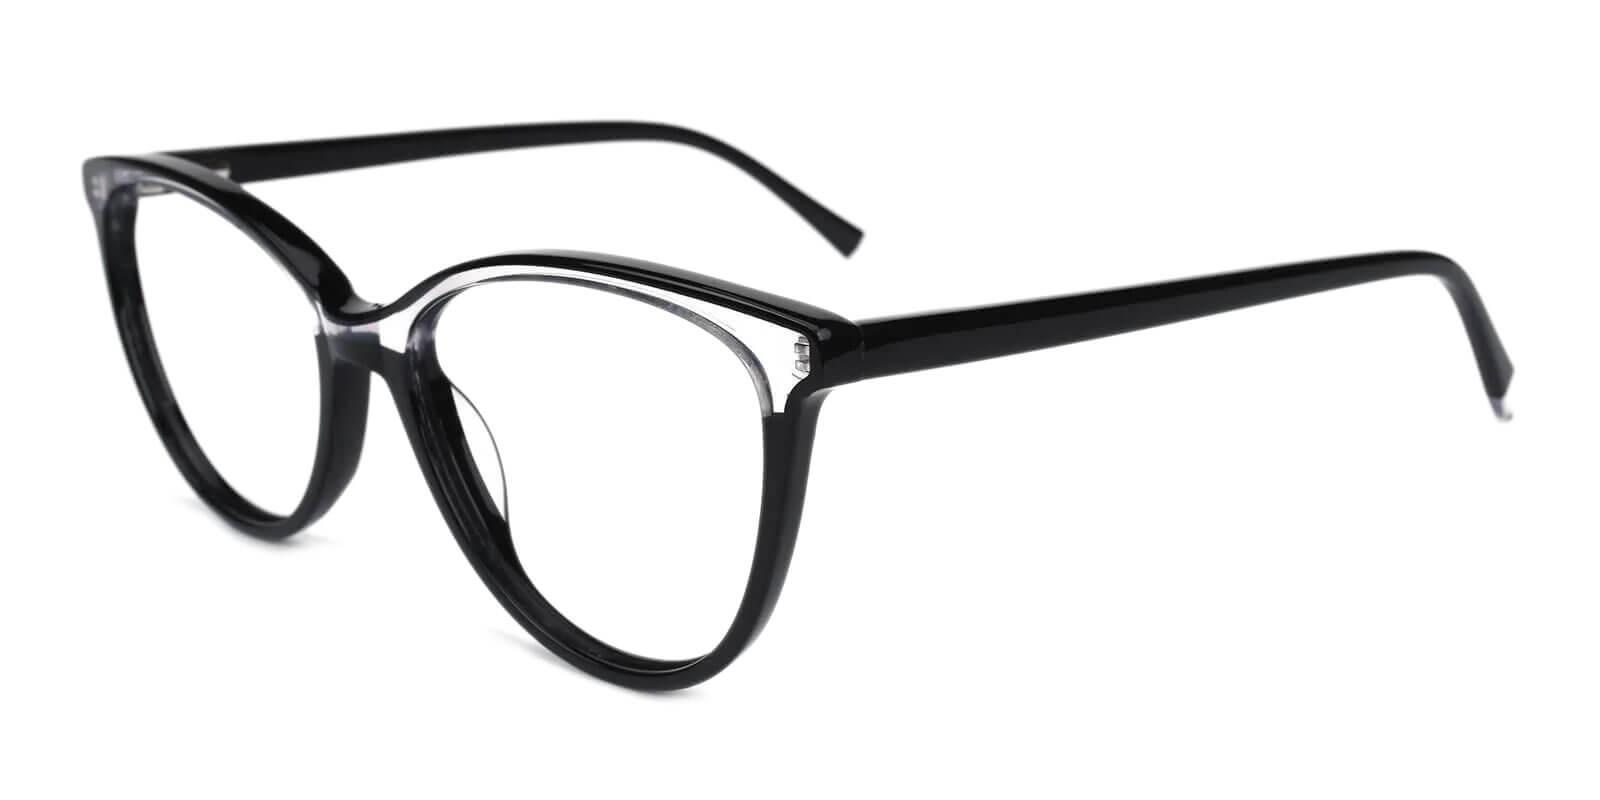 Magnus Black Acetate Eyeglasses , SpringHinges , UniversalBridgeFit Frames from ABBE Glasses